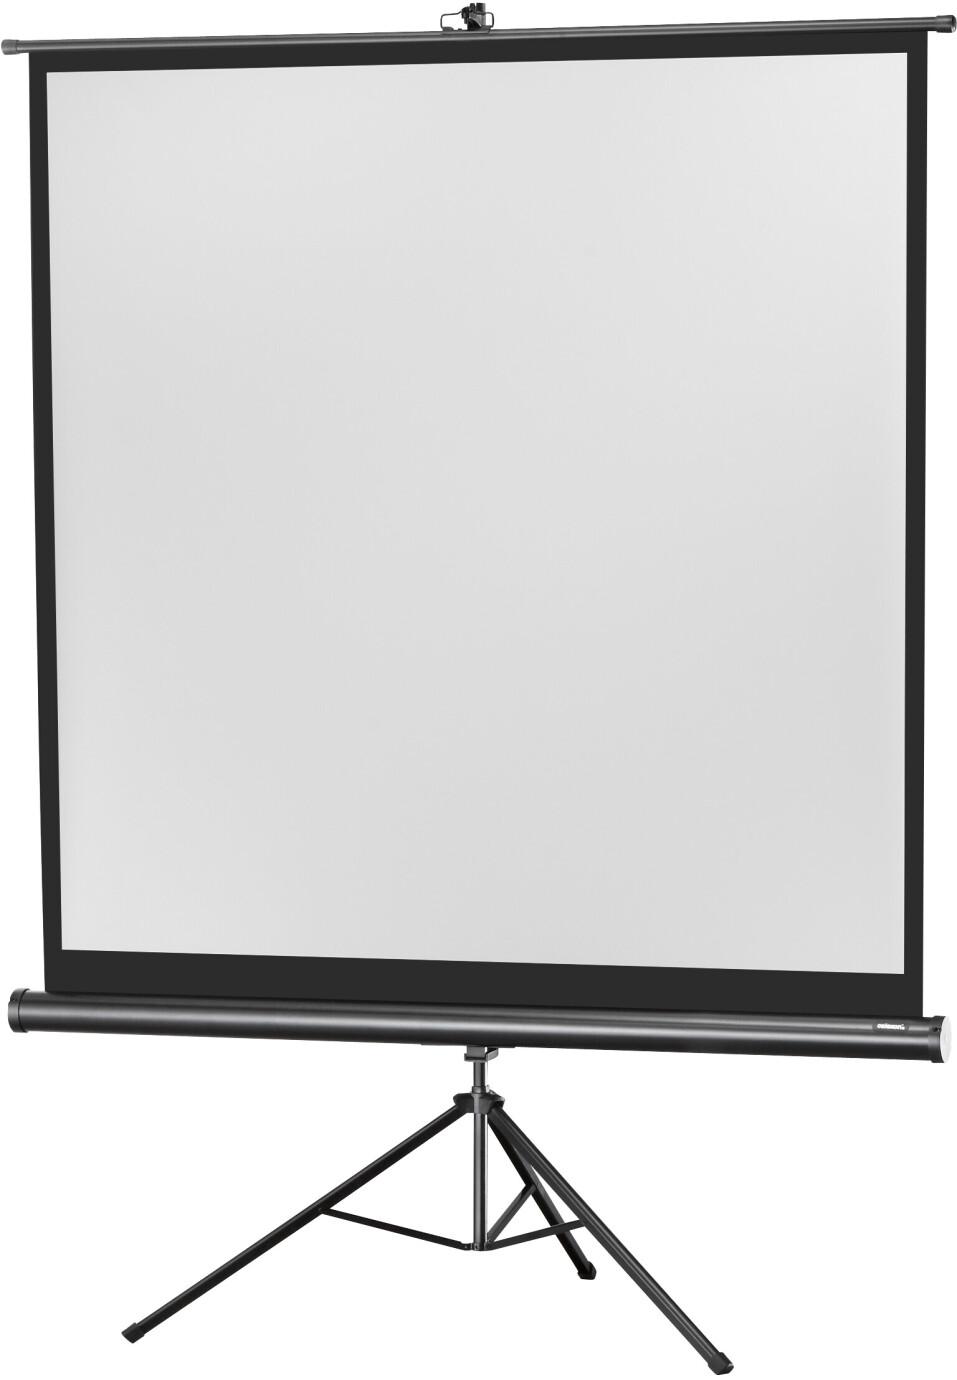 Celexon - Economy - 133cm x 133cm - 1:1 - Tripod Projector Screen